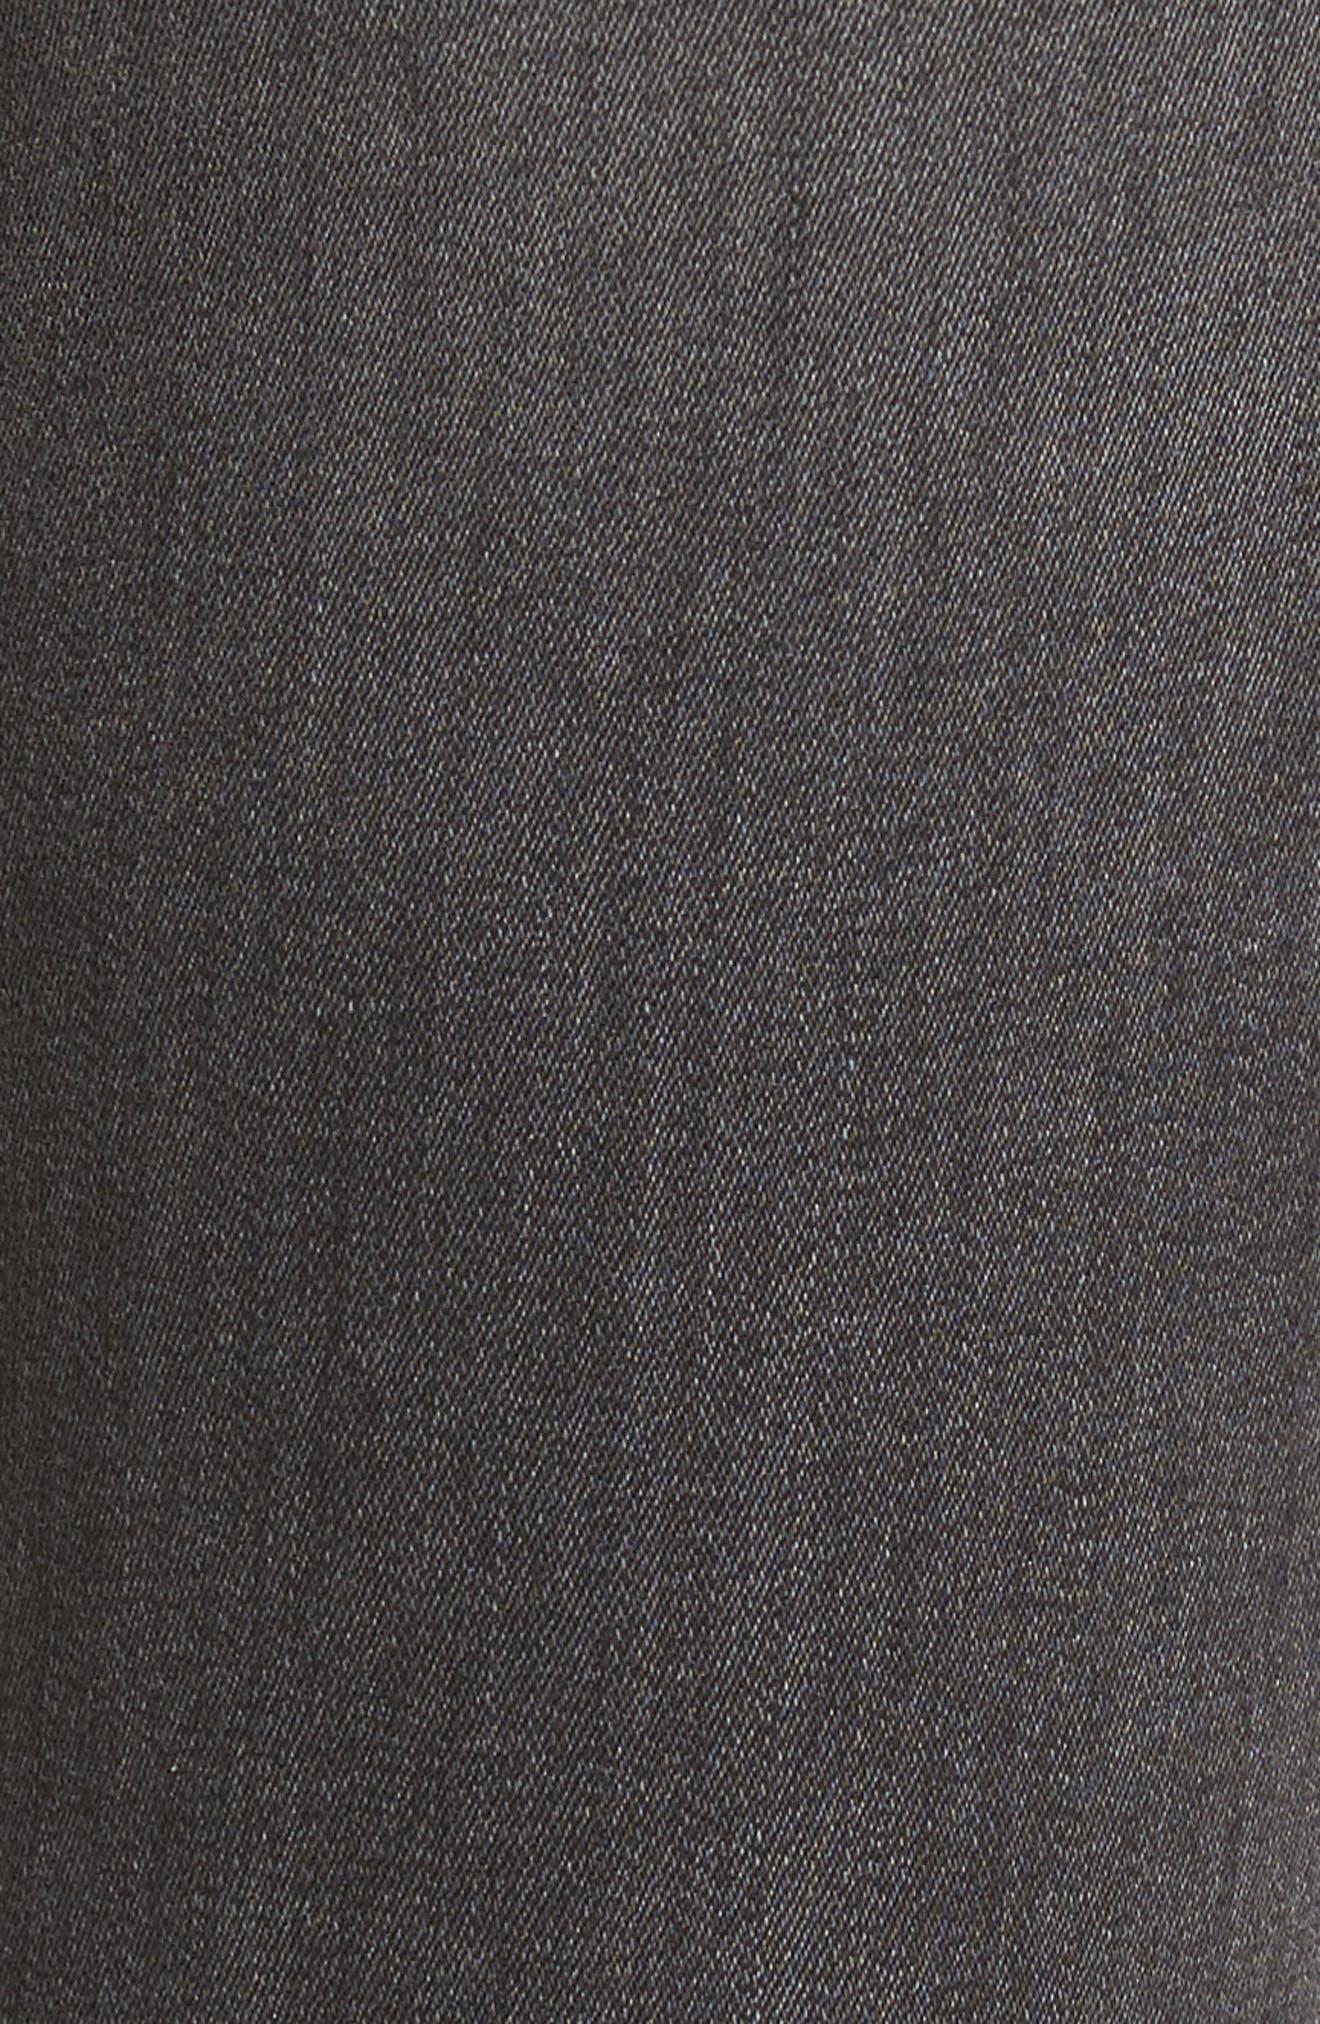 Farrow High Waist Instaslim Skinny Jeans,                             Alternate thumbnail 5, color,                             020